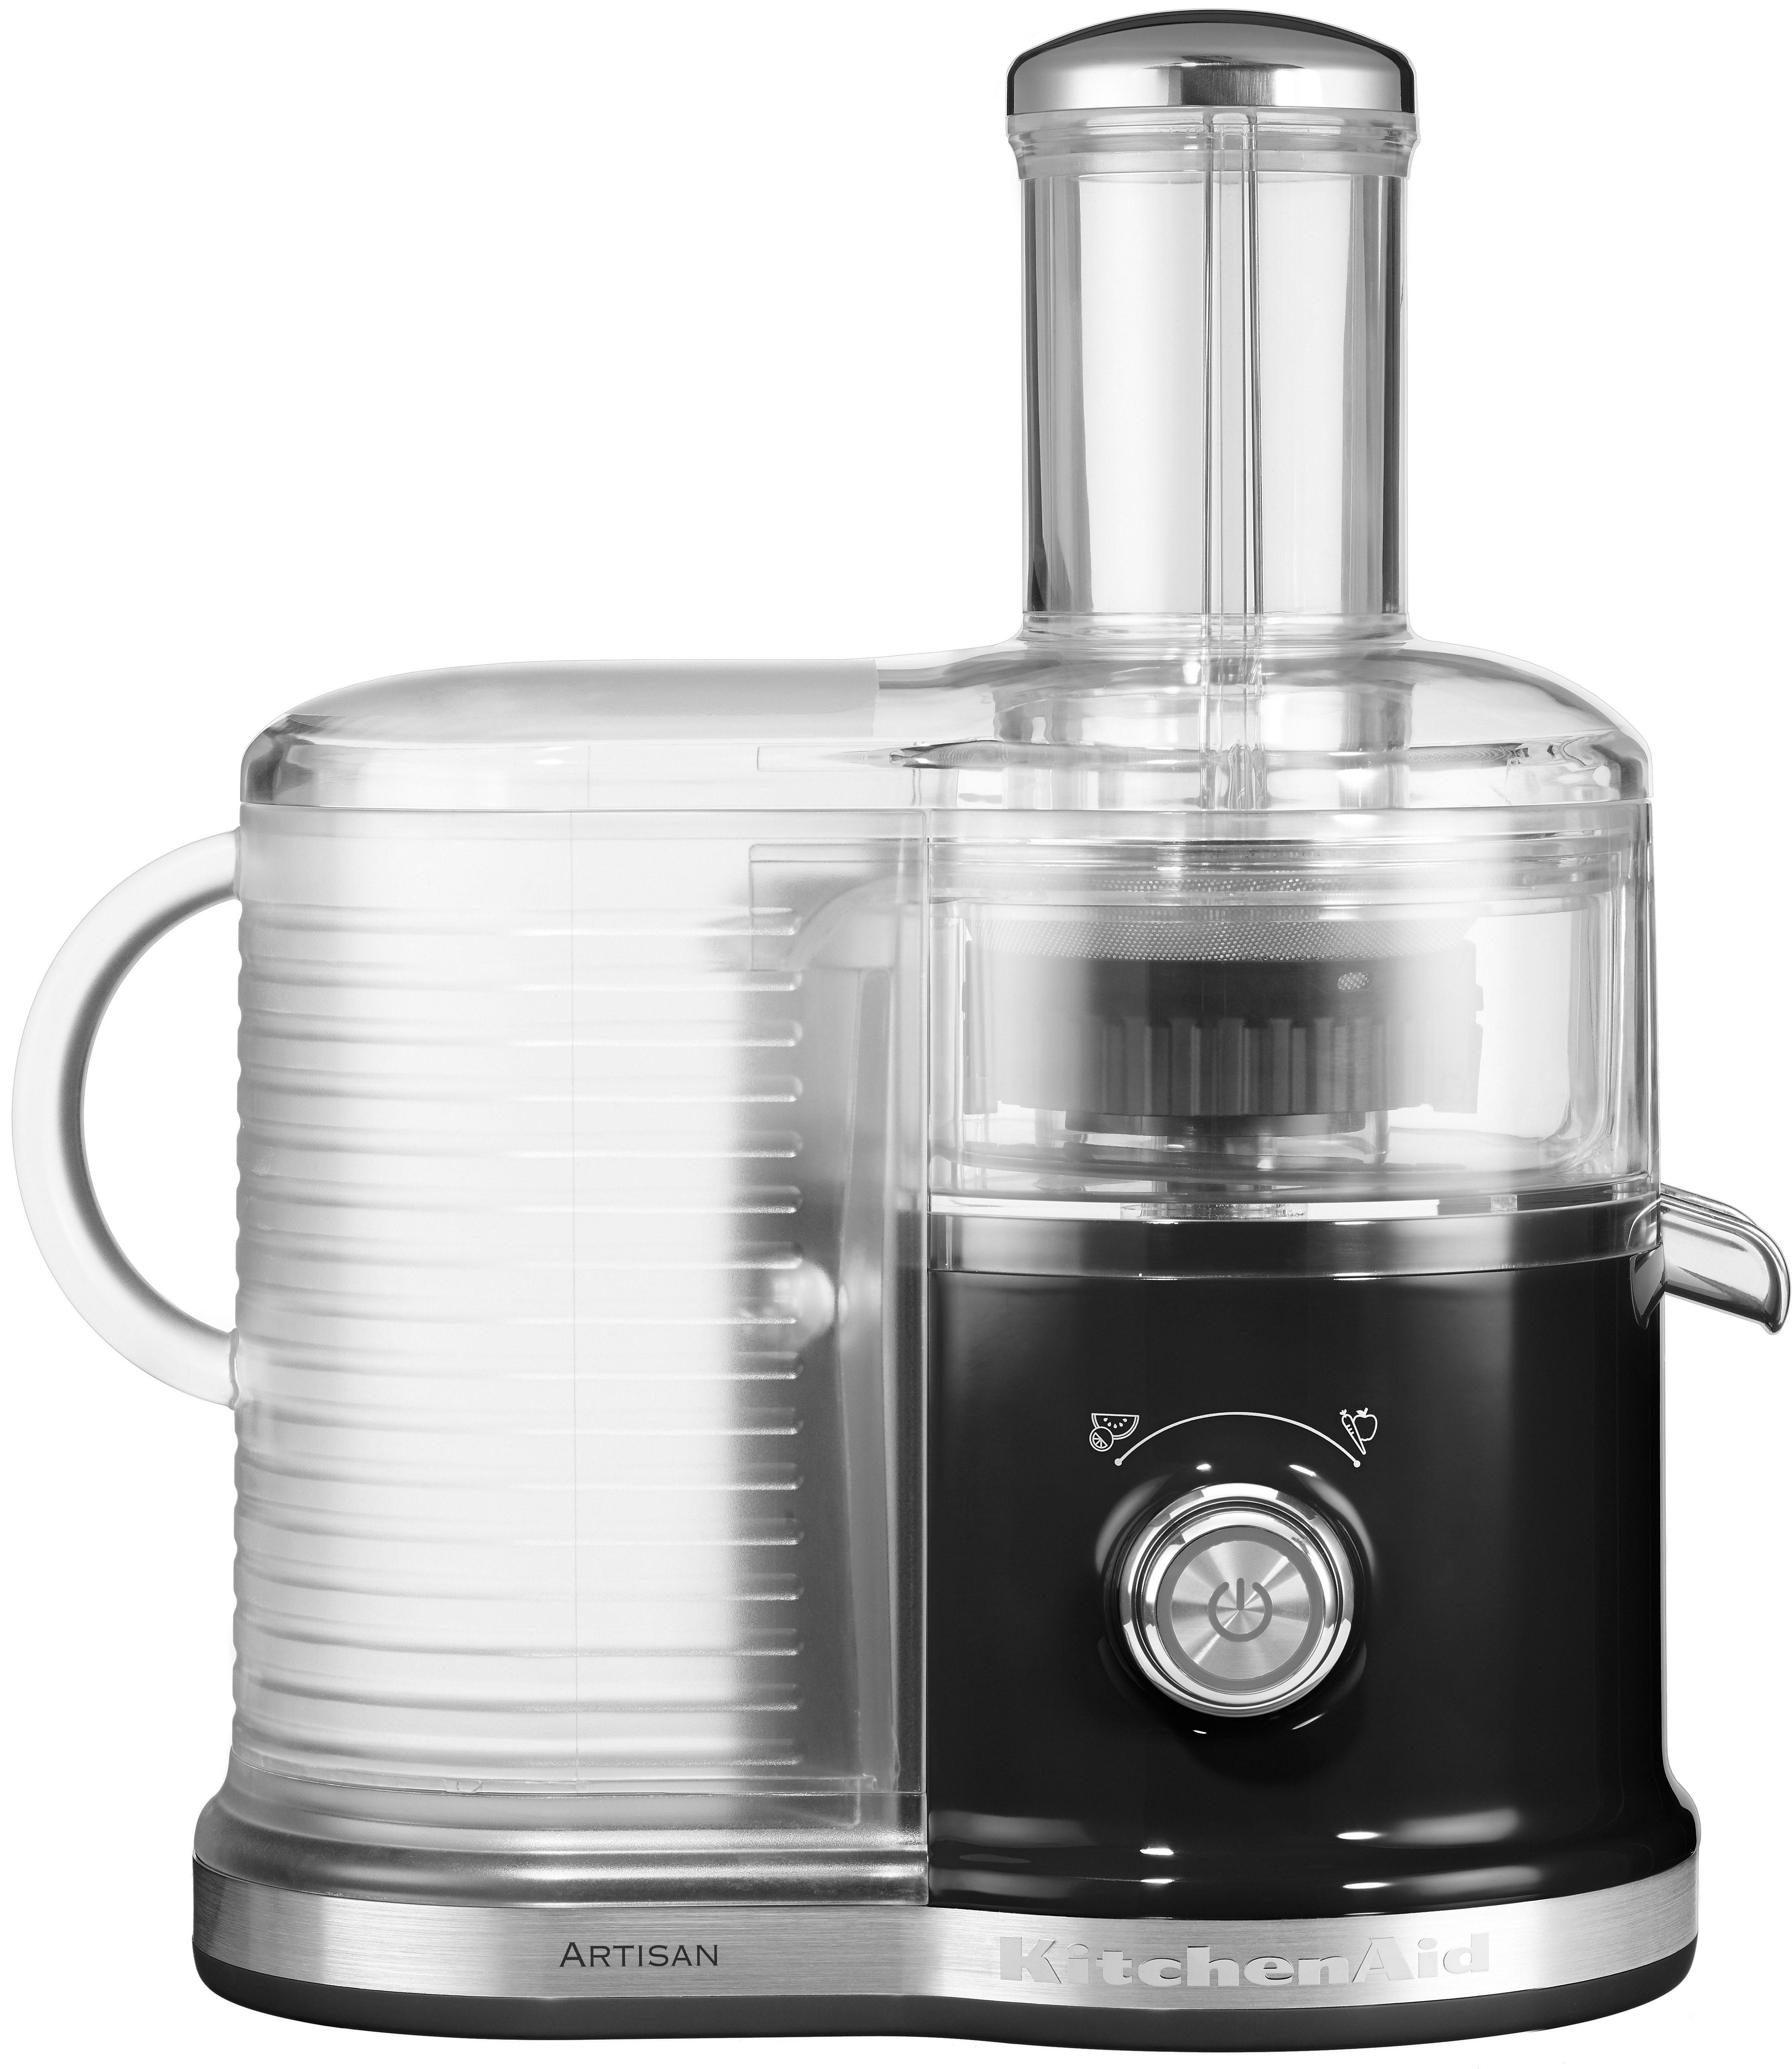 KitchenAid Artisan Zentrifugal Entsafter 5KVJ0333EOB, onxy schwarz, 520 Watt